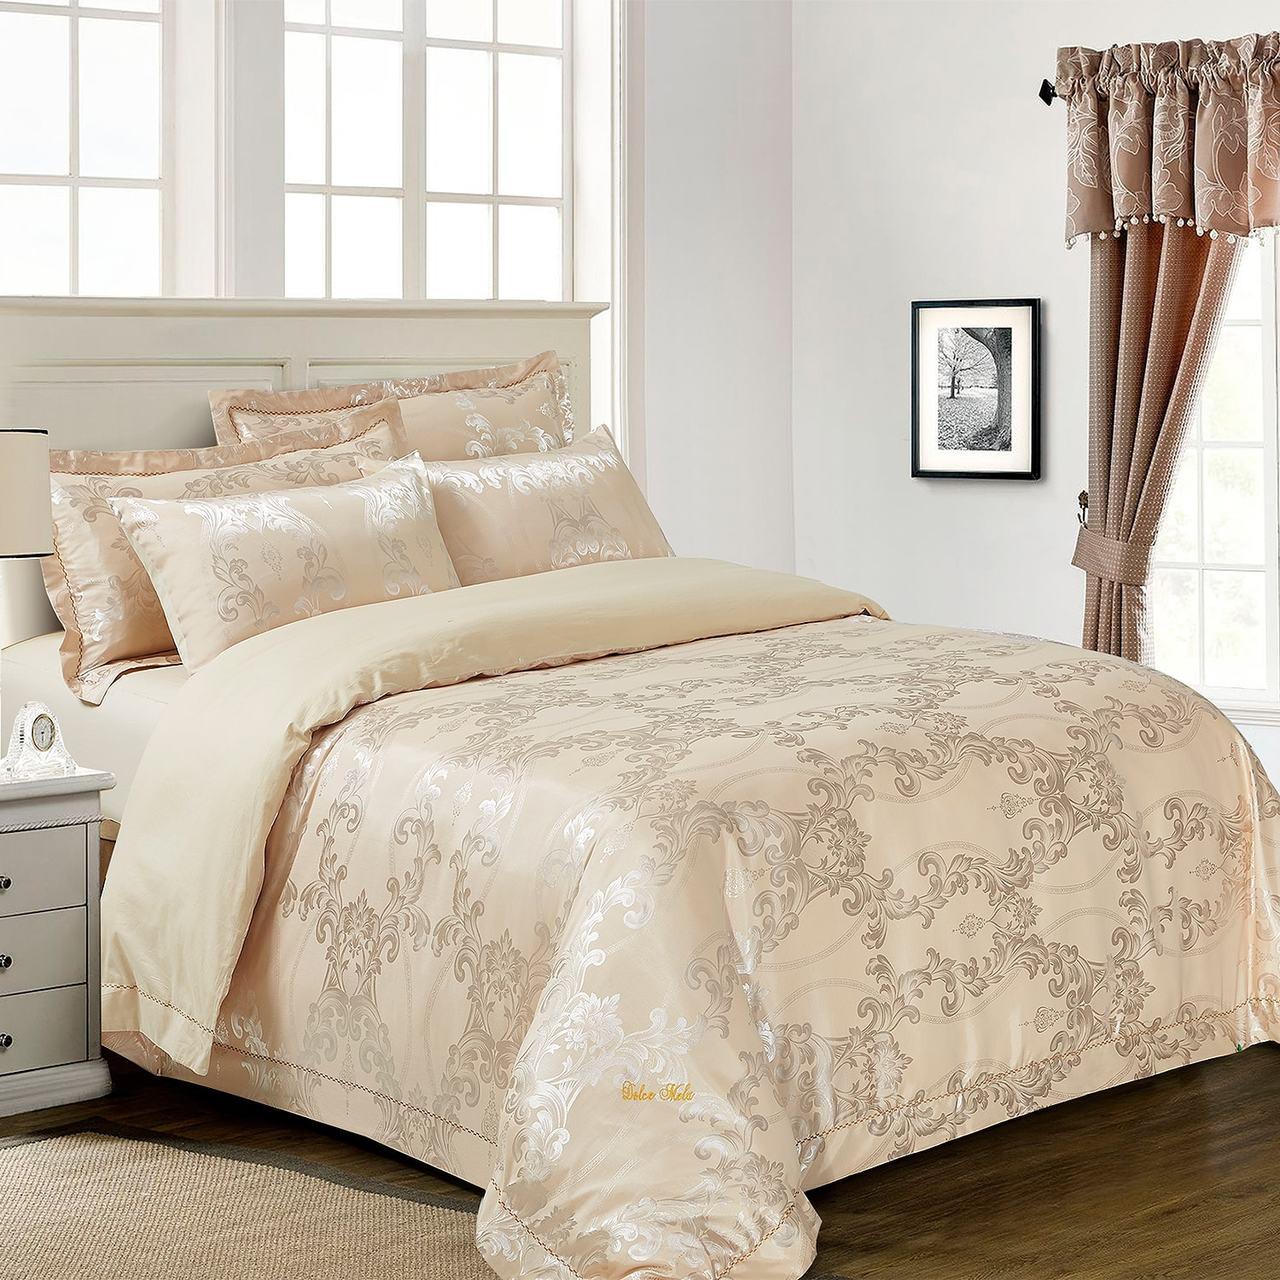 DM507Q Queen size Dolce Mela Bedding Set UPC: 8171460143612